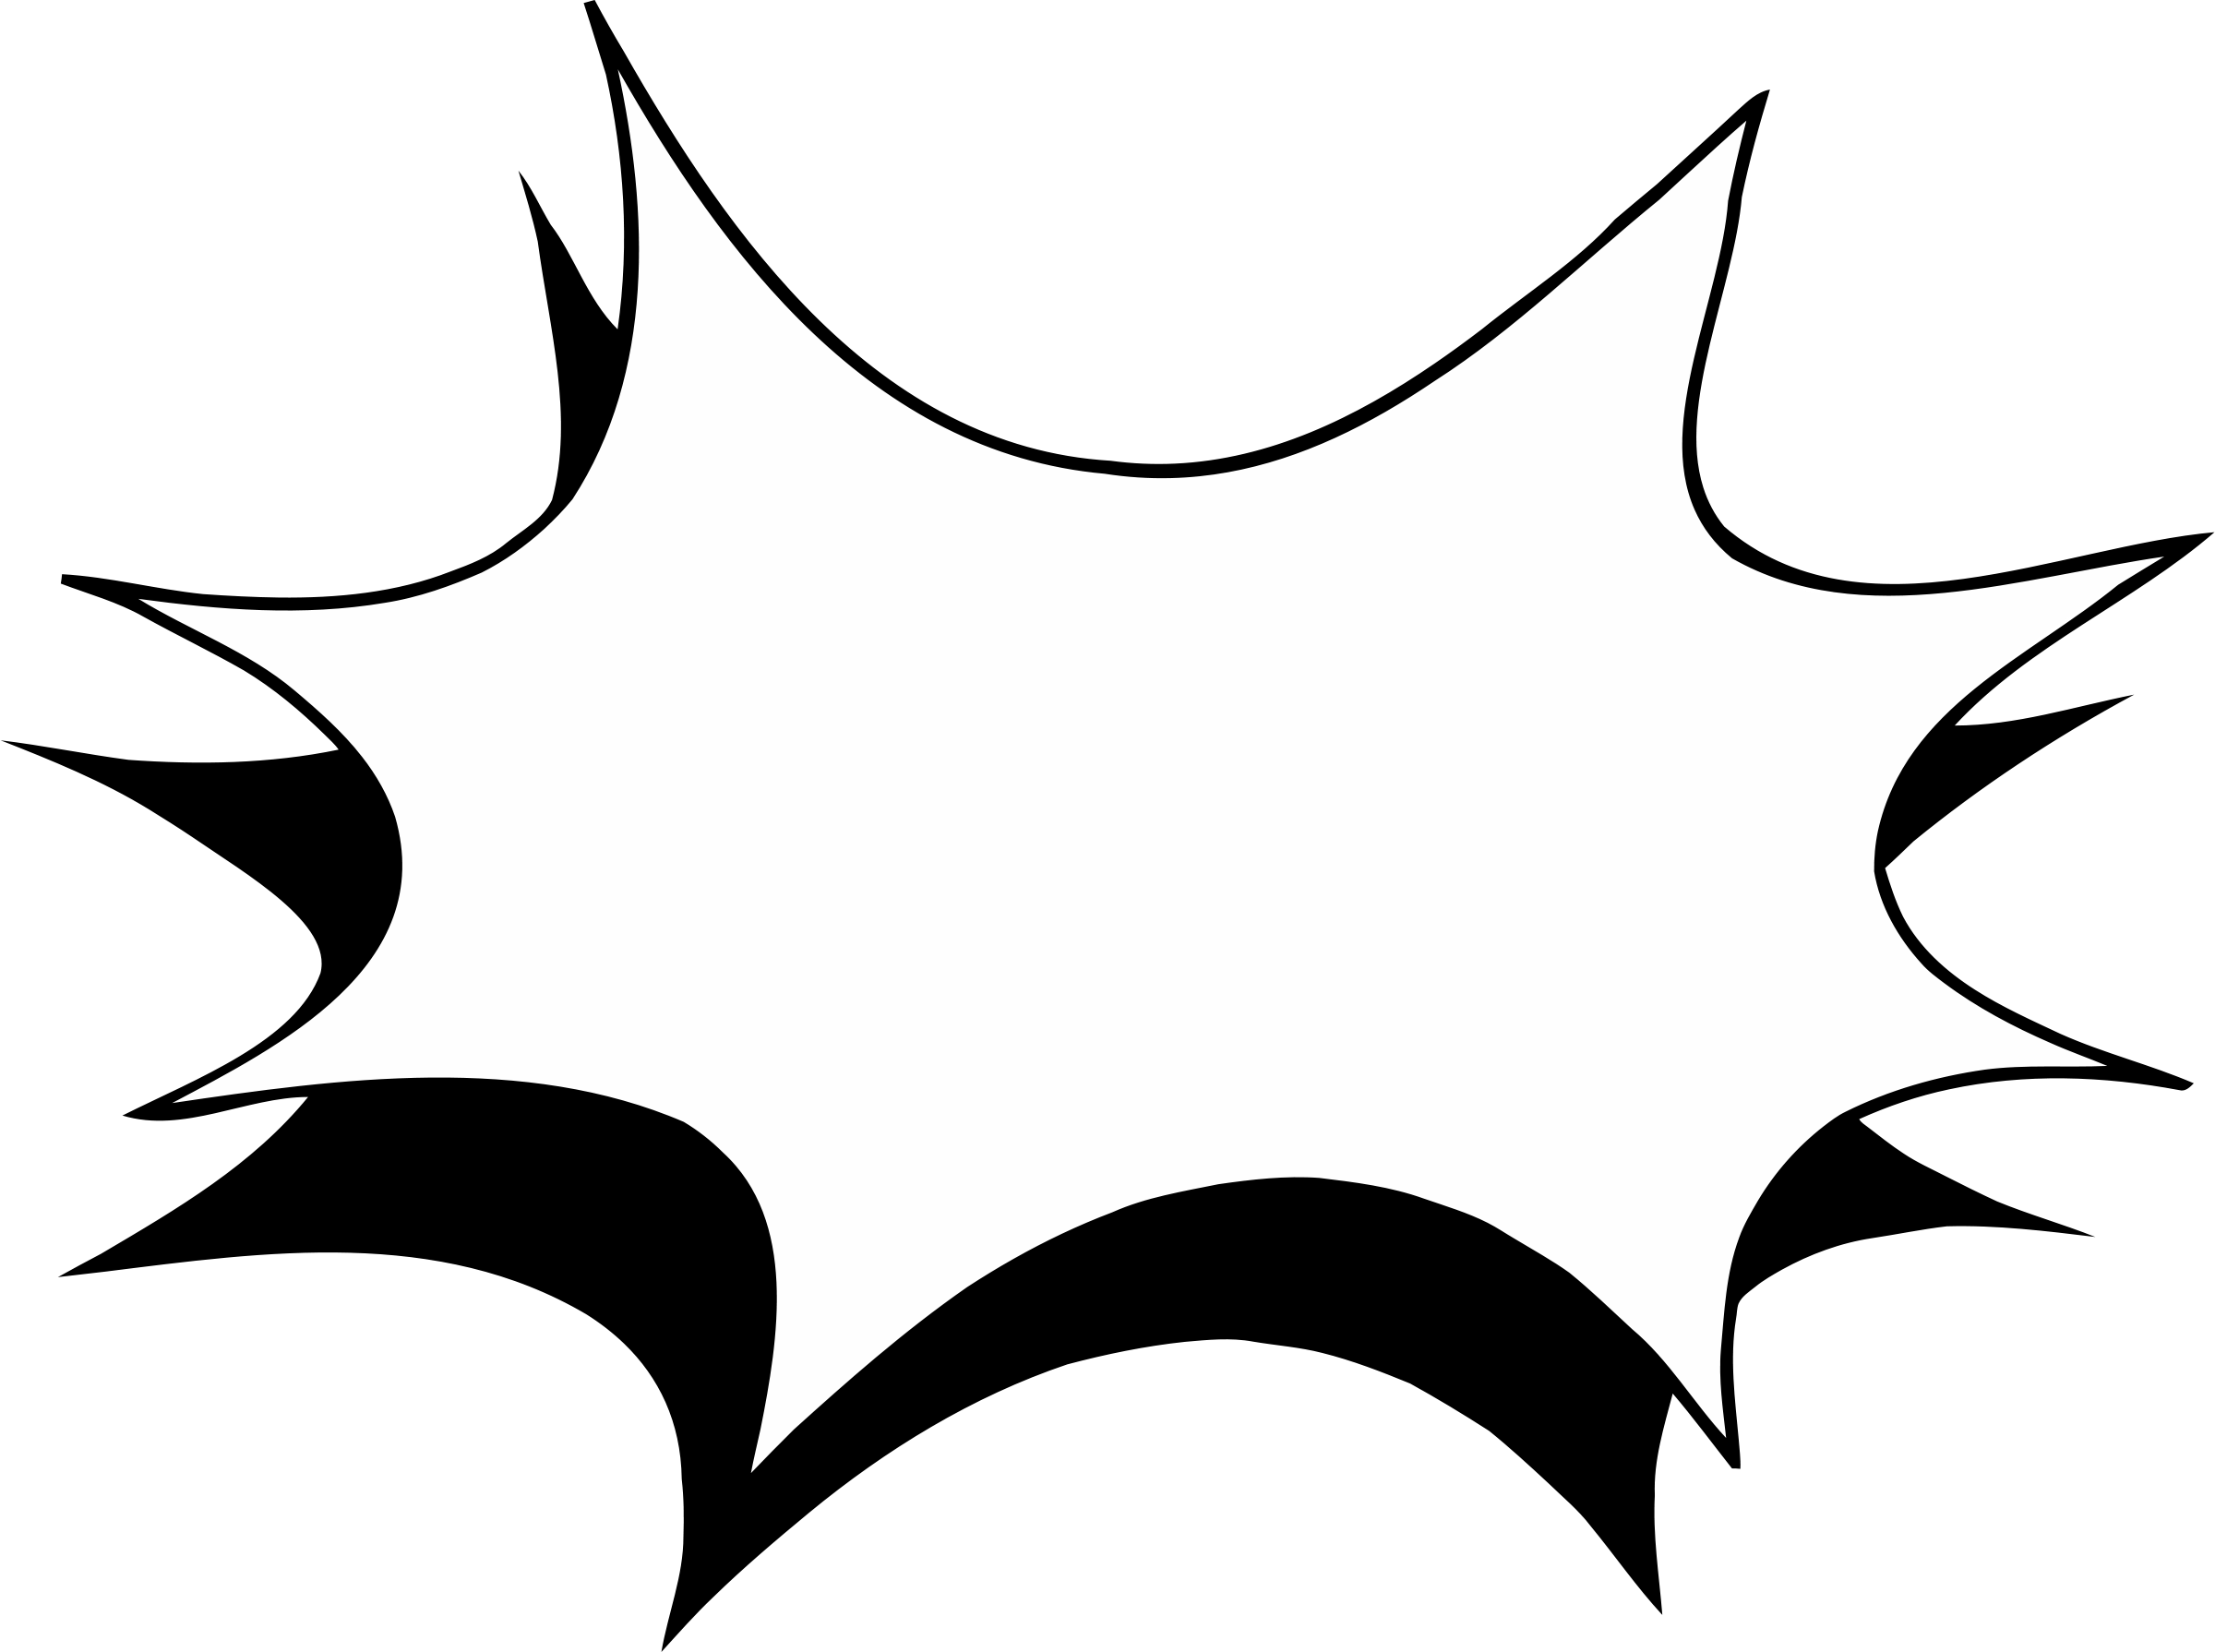 4 star burst. Free cliparts | Clipart Panda - Free Clipart ...